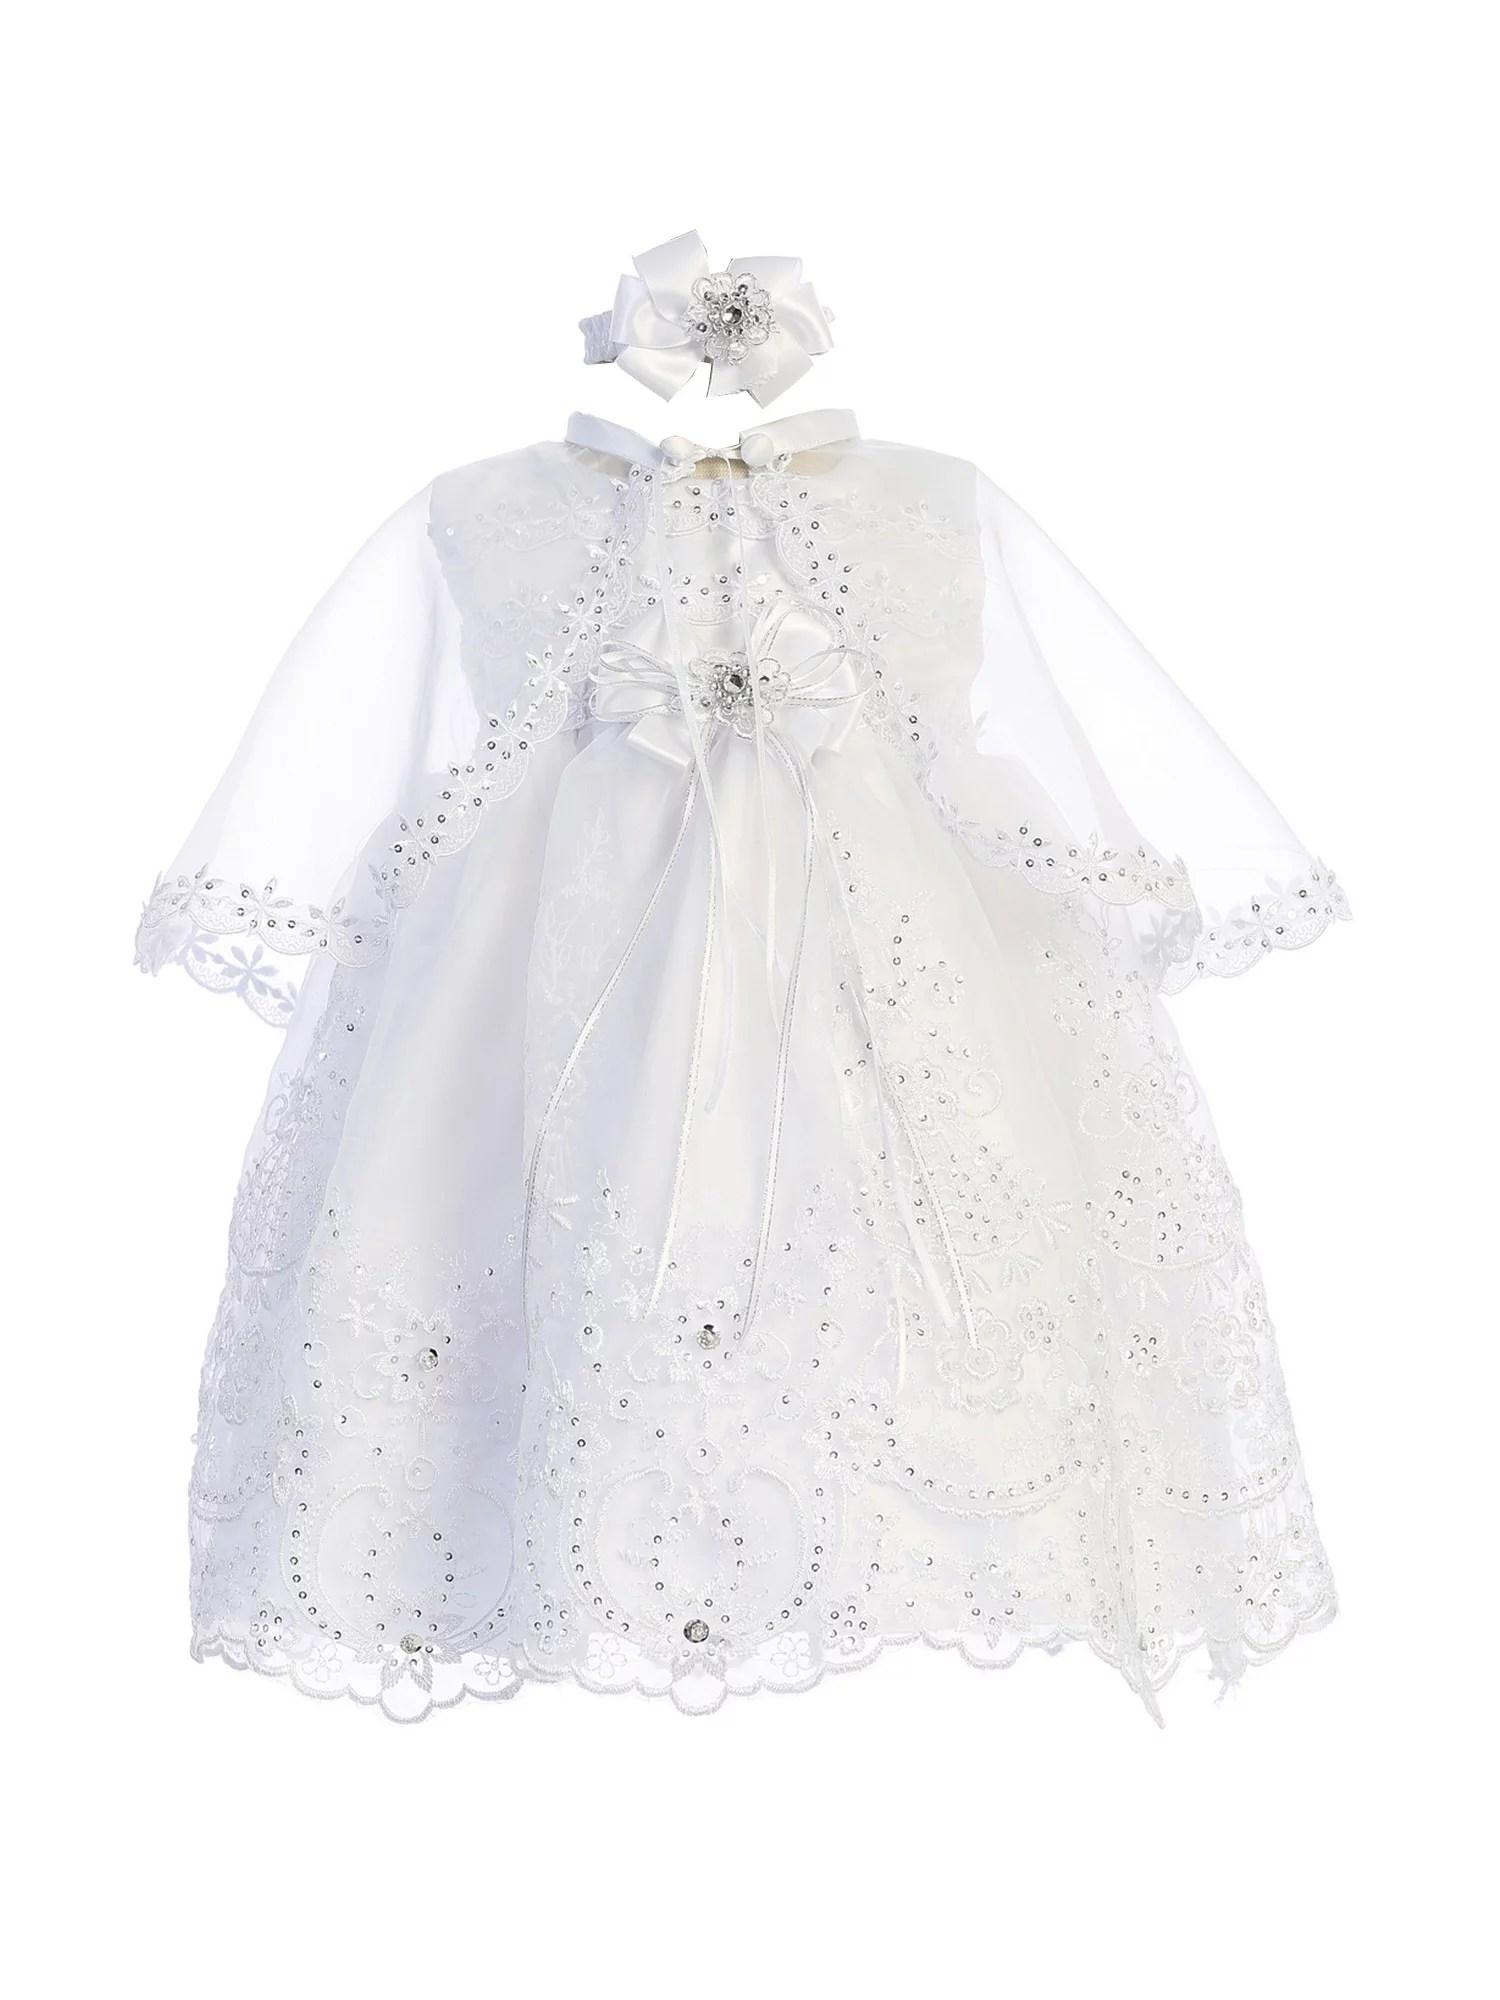 Angels Garment White Organza Headband 2 Pc Baptism Cape